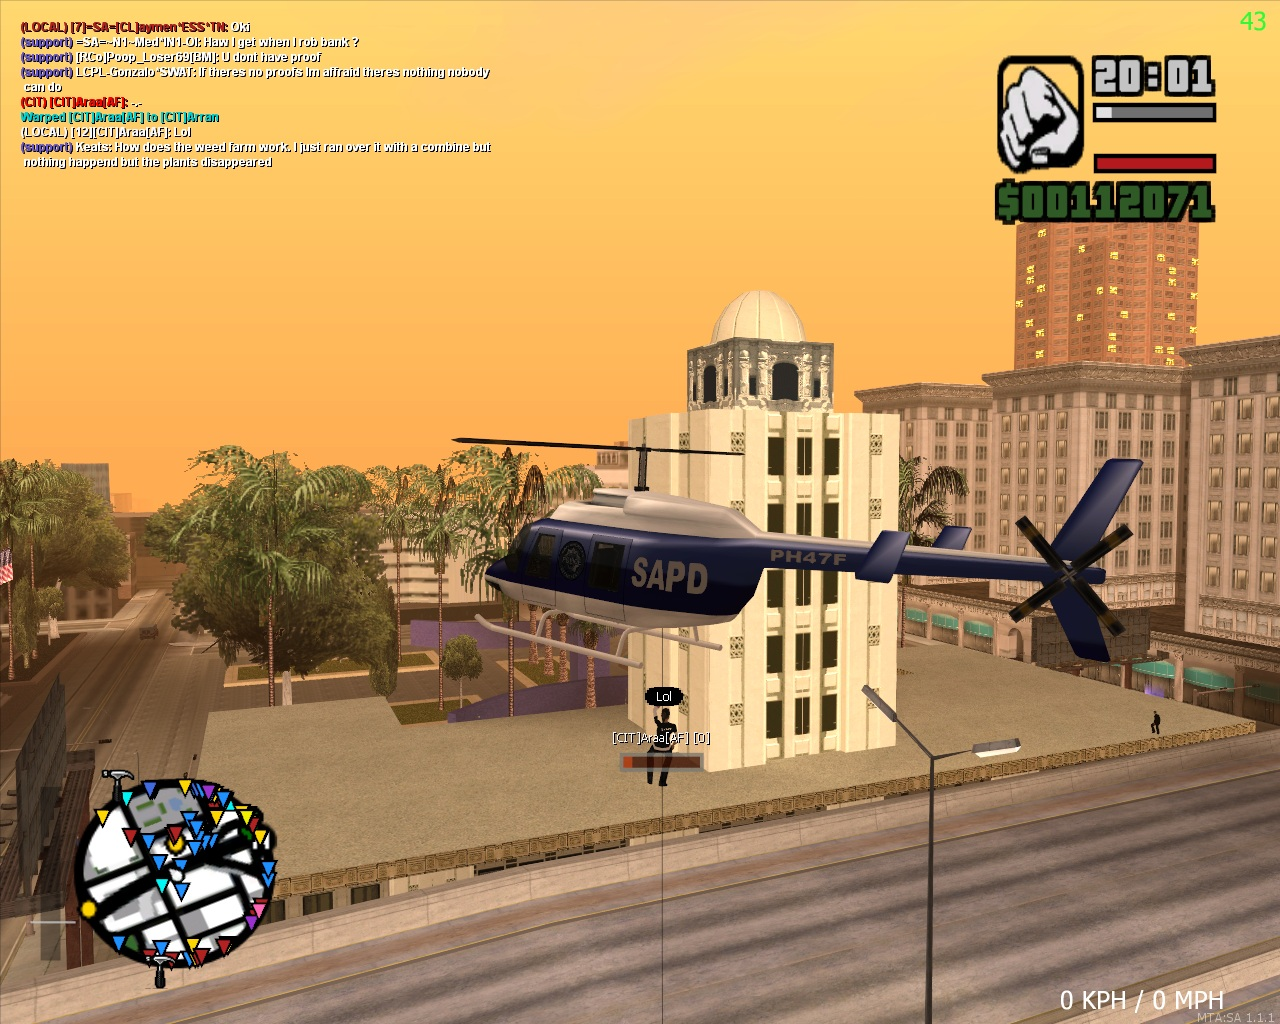 B Multi Theft Auto/b: San Andreas - Download.